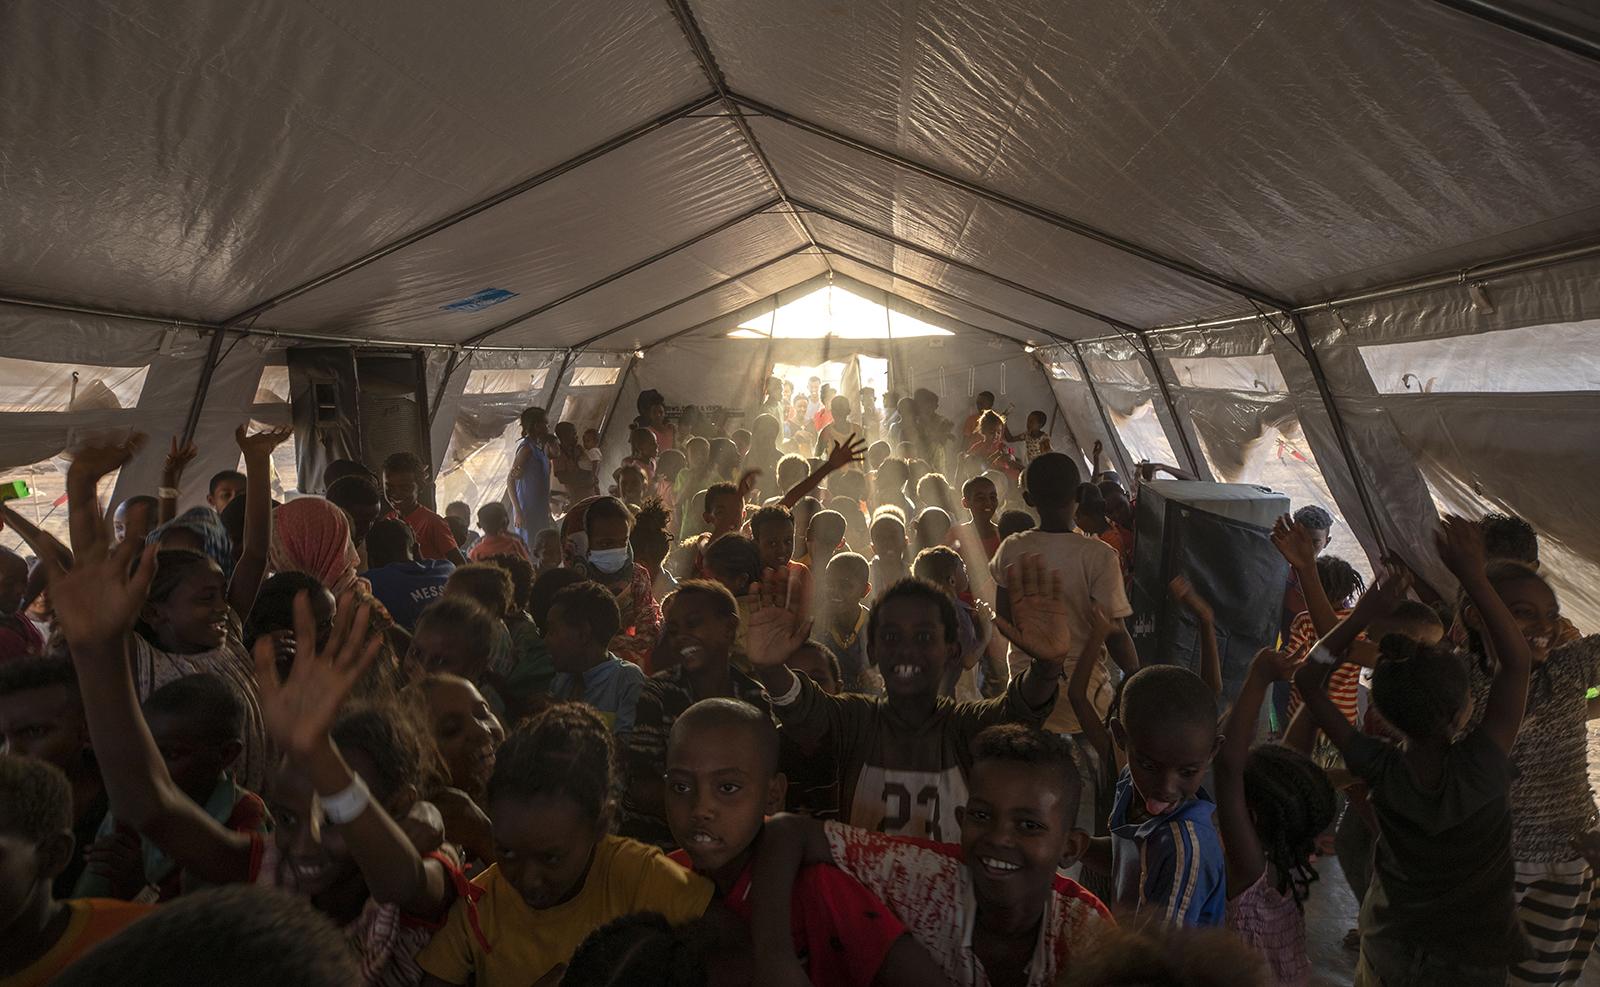 Tigray refugee children sing and dance inside a tent run by UNICEF for children's activities, in Umm Rakouba refugee camp in Qadarif, eastern Sudan, Thursday, Dec. 10, 2020. AP